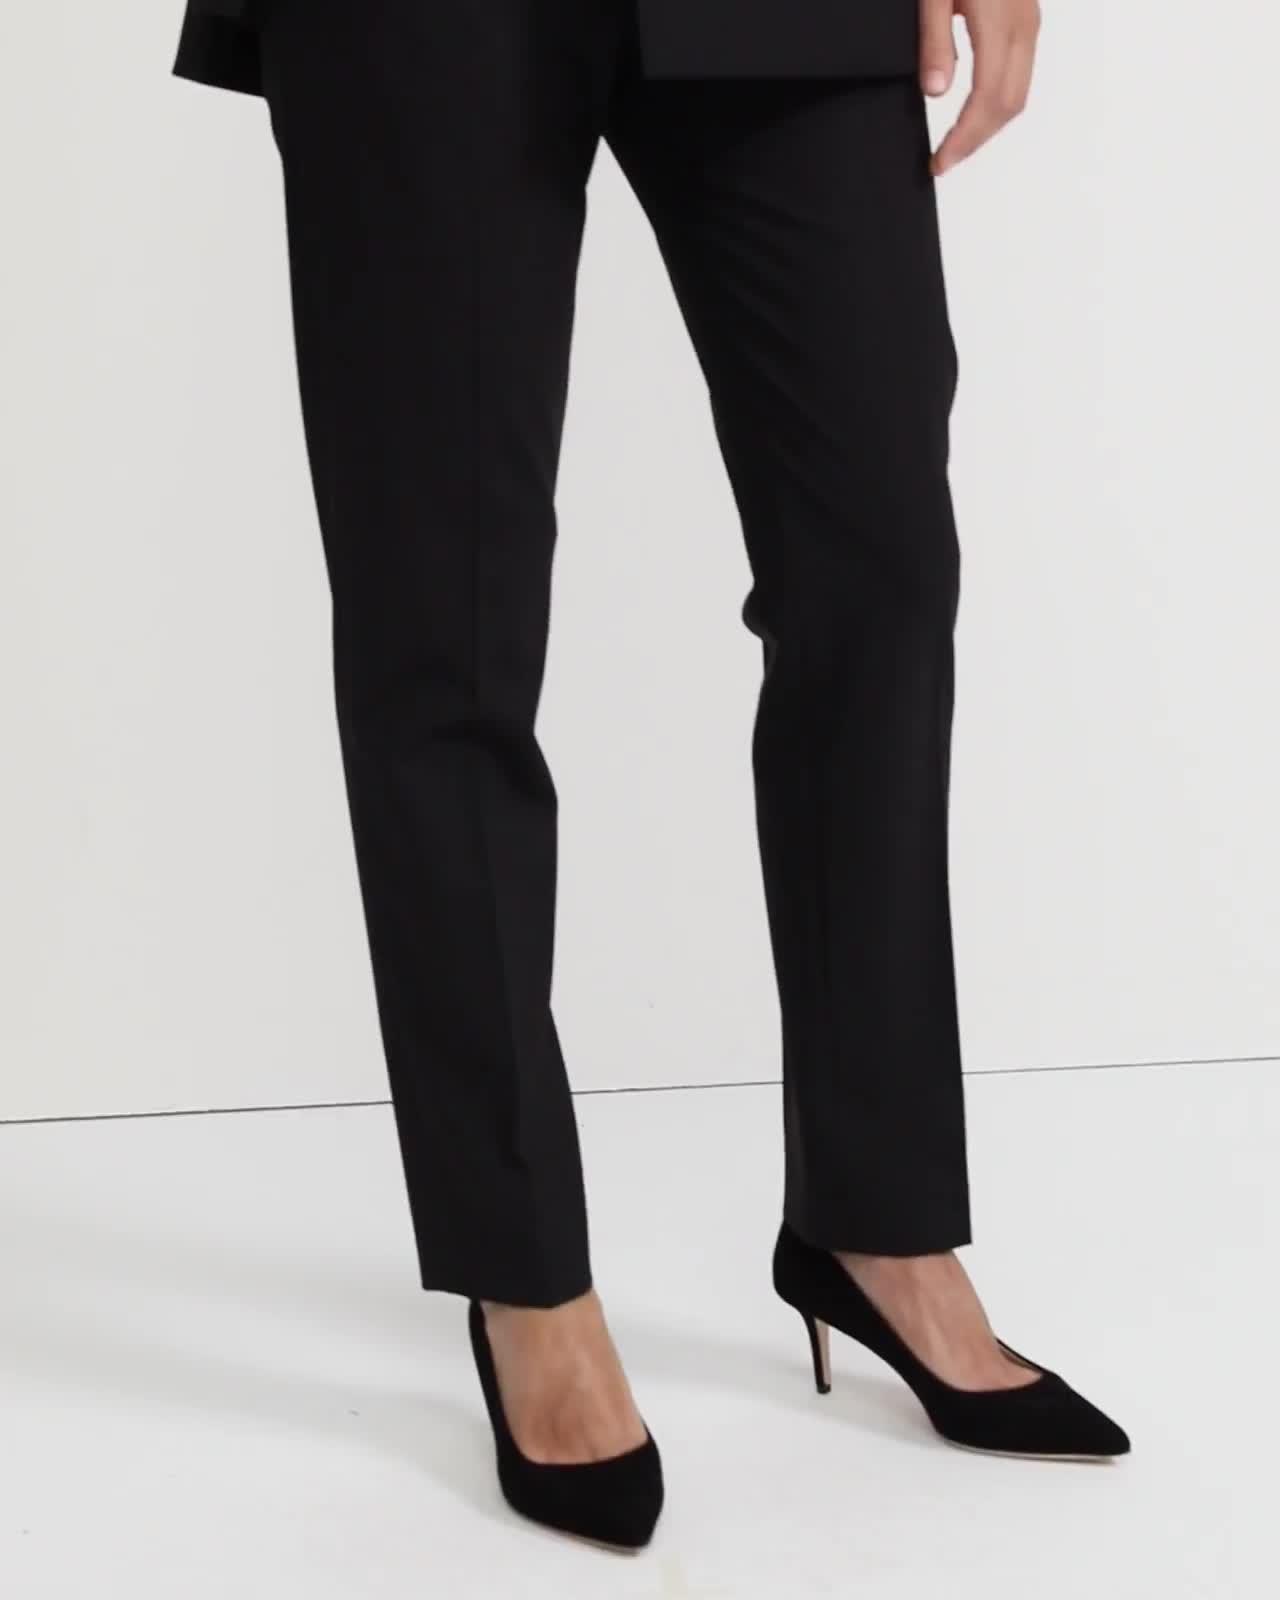 Treeca Full Length Pant in Good Wool